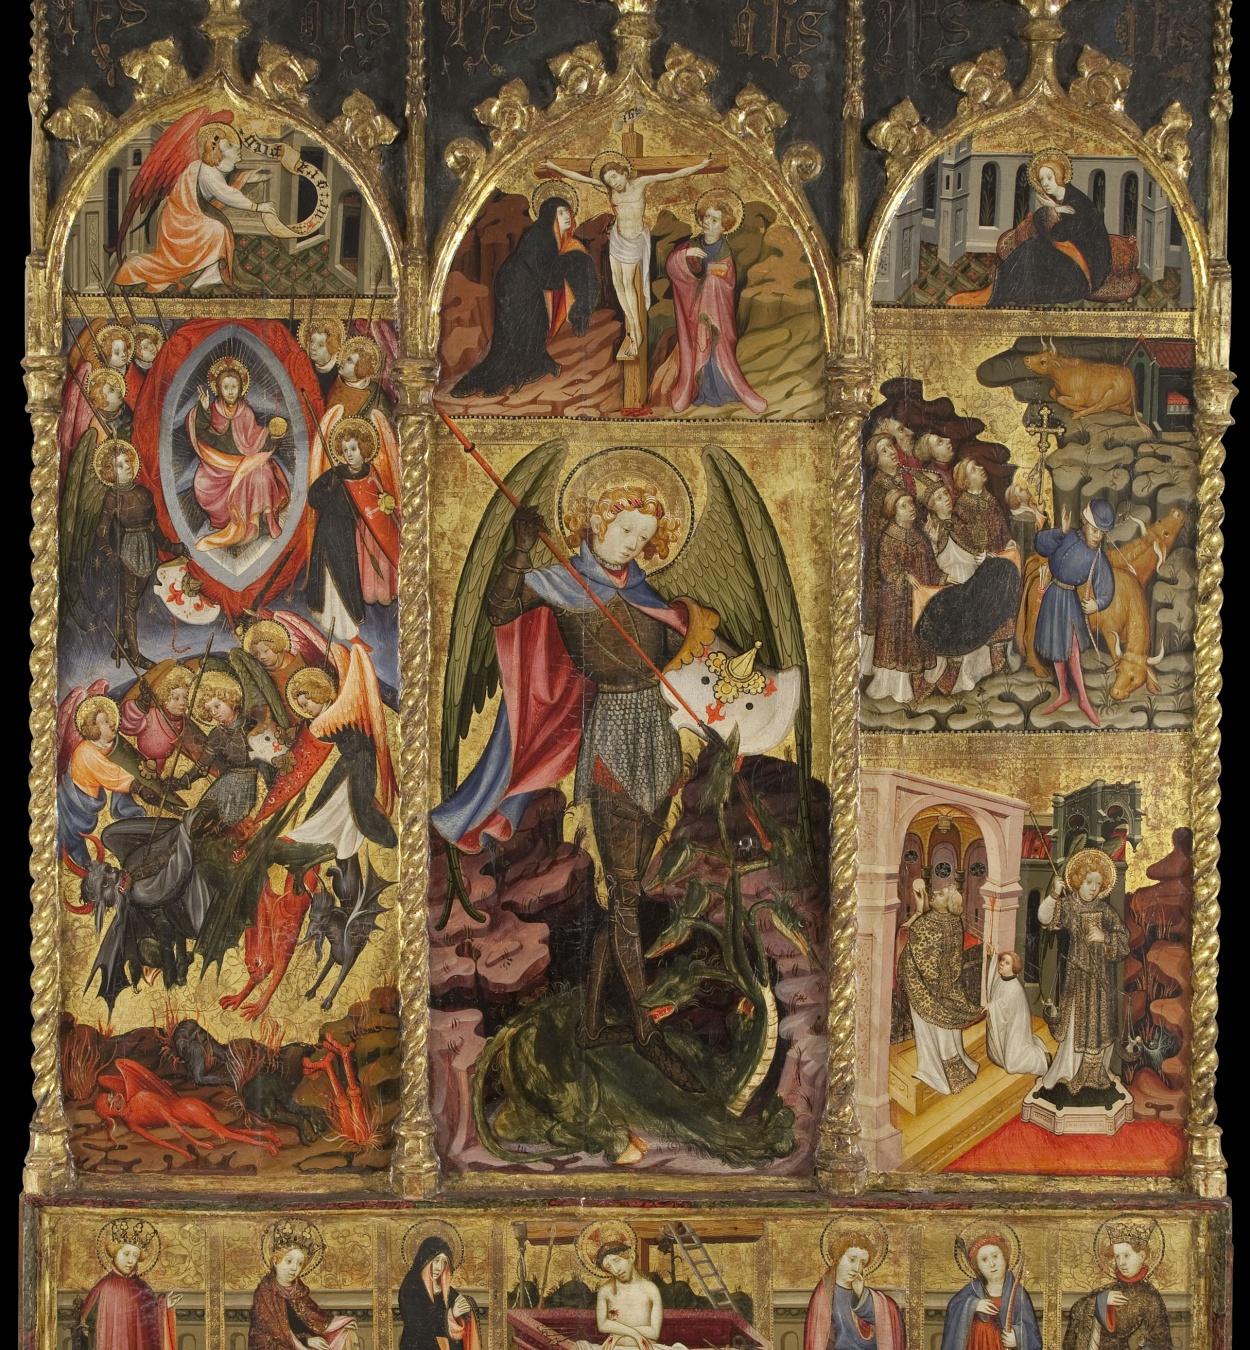 Joan Mates - Altarpiece of Saint Michael the Archangel - First quarter of 15th century